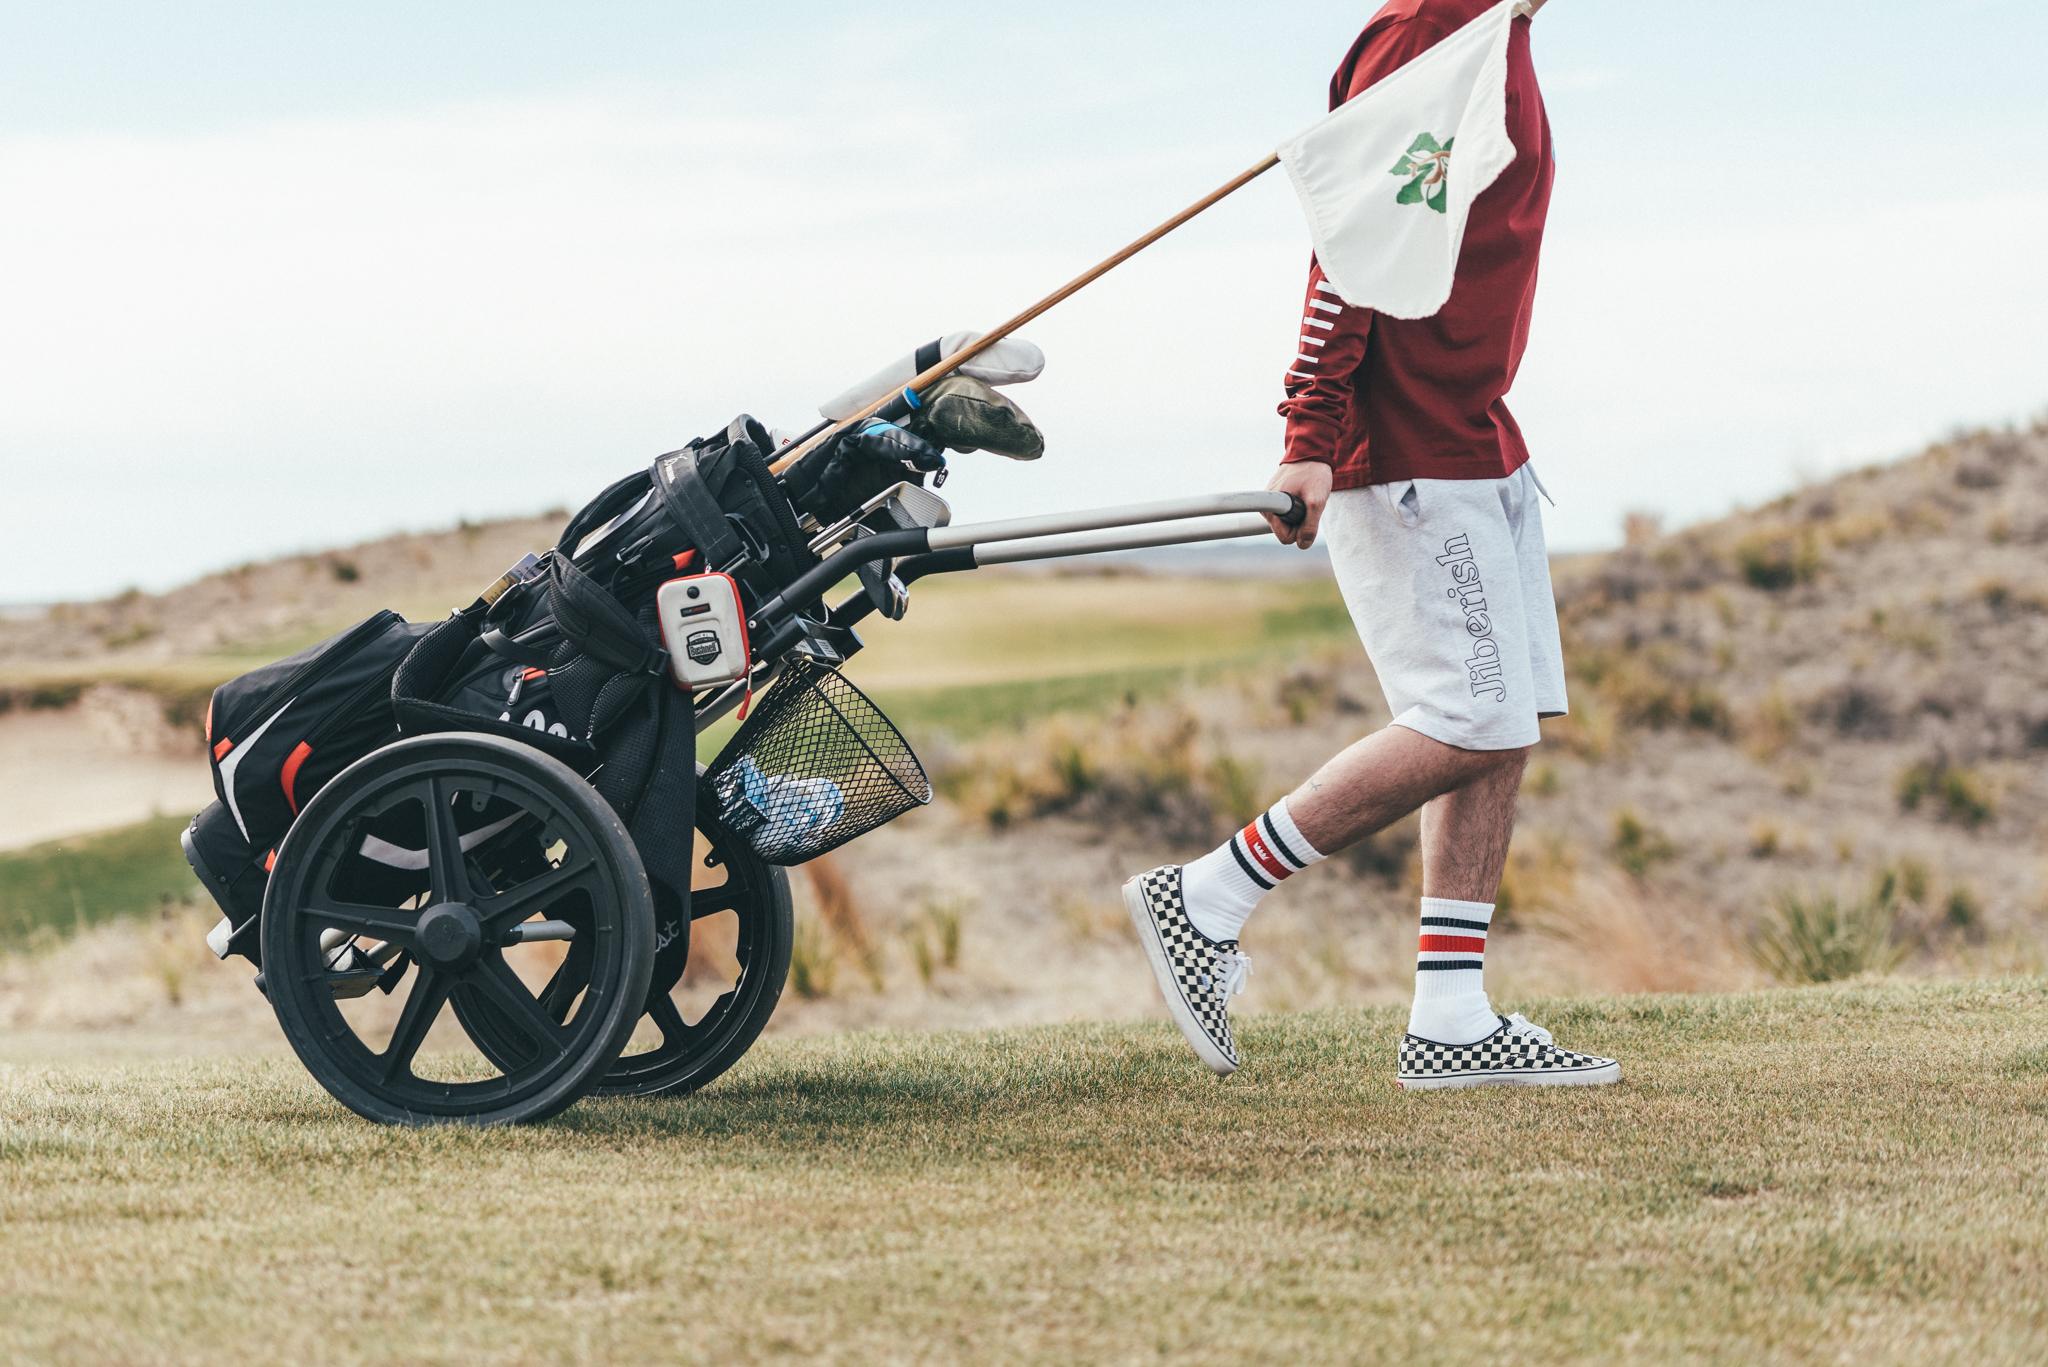 Olympic '76 Long Sleeve, Hometown Fleece Shorts, Crown Tube Socks